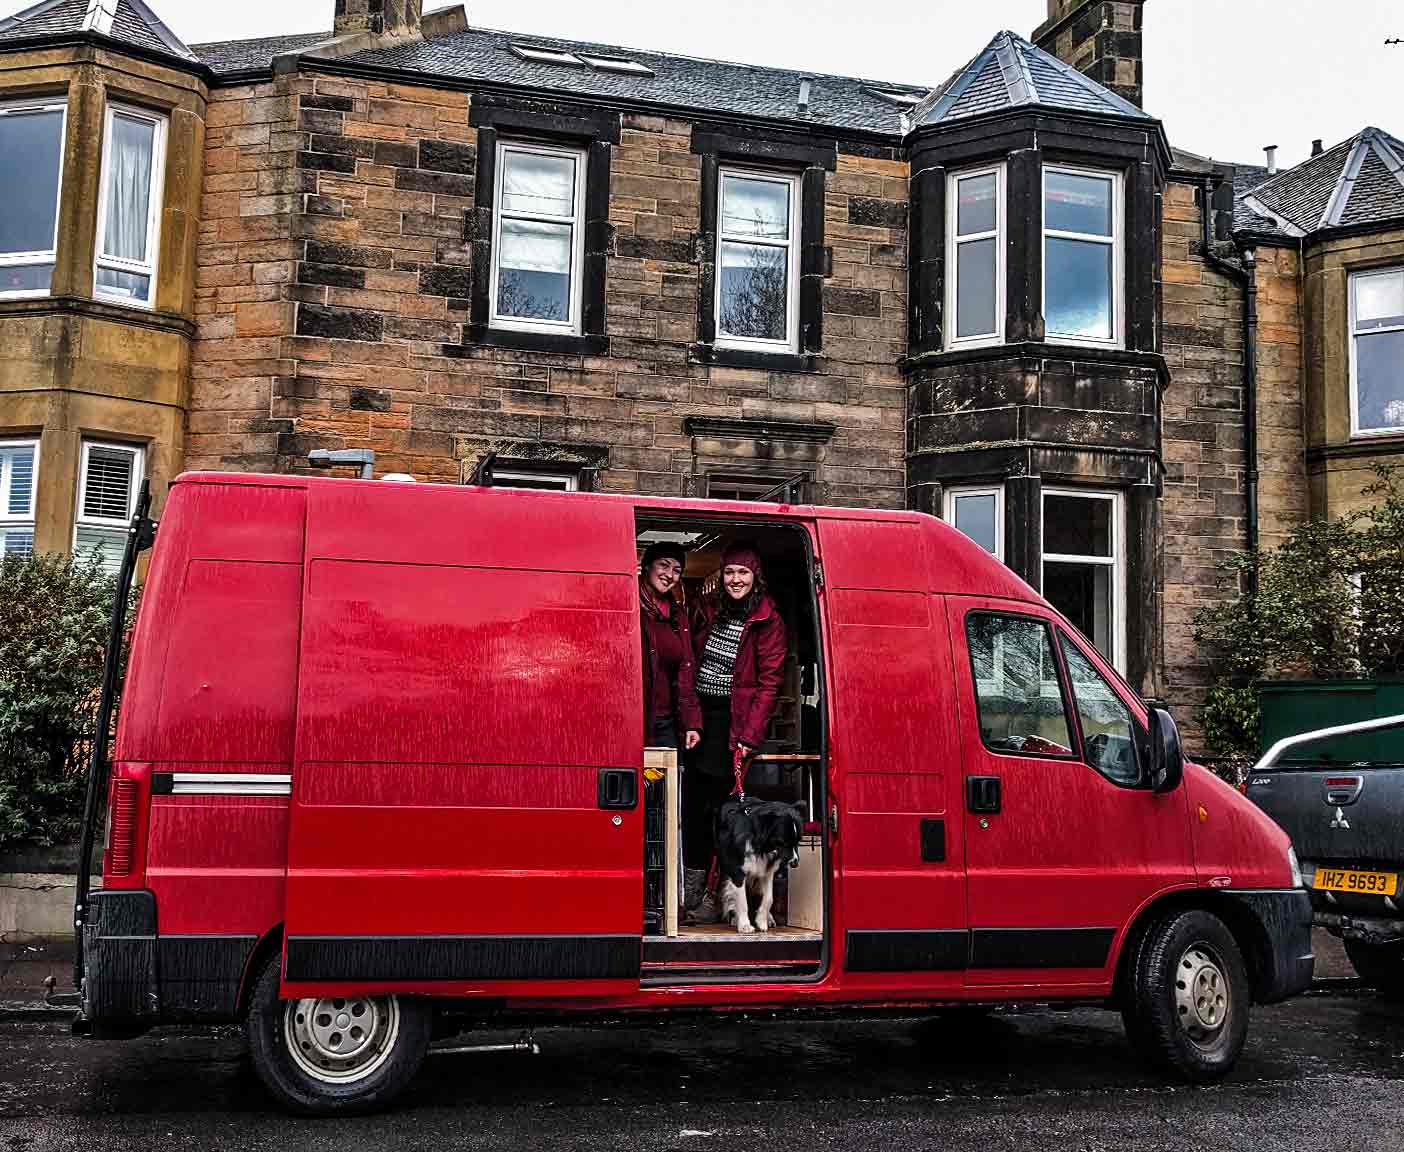 fiat ducato maxi der wohnmobil kastenwagen als camper ausbau. Black Bedroom Furniture Sets. Home Design Ideas